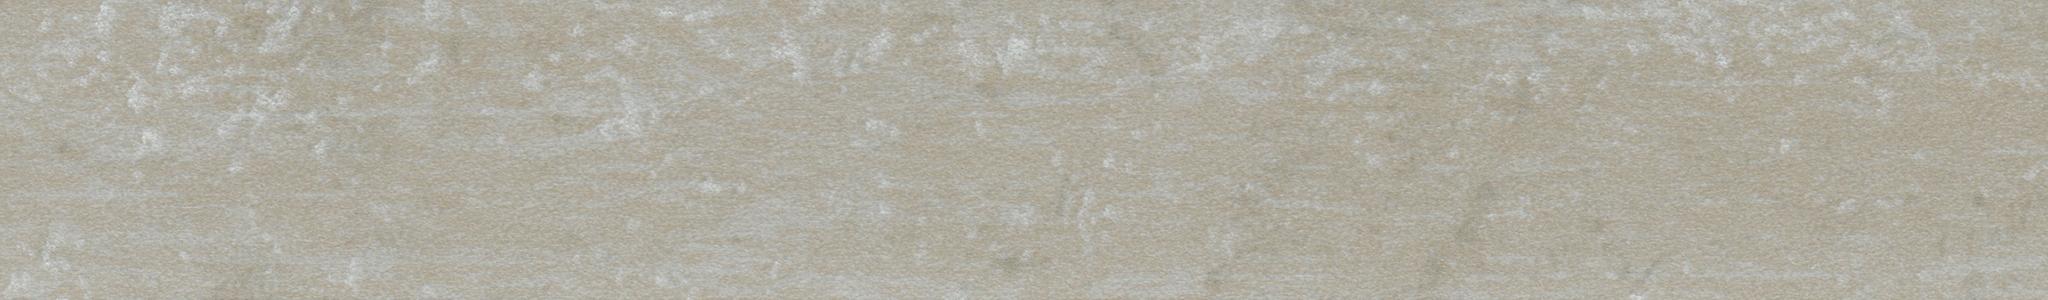 HD 29274 ABS hrana beton světlý perla